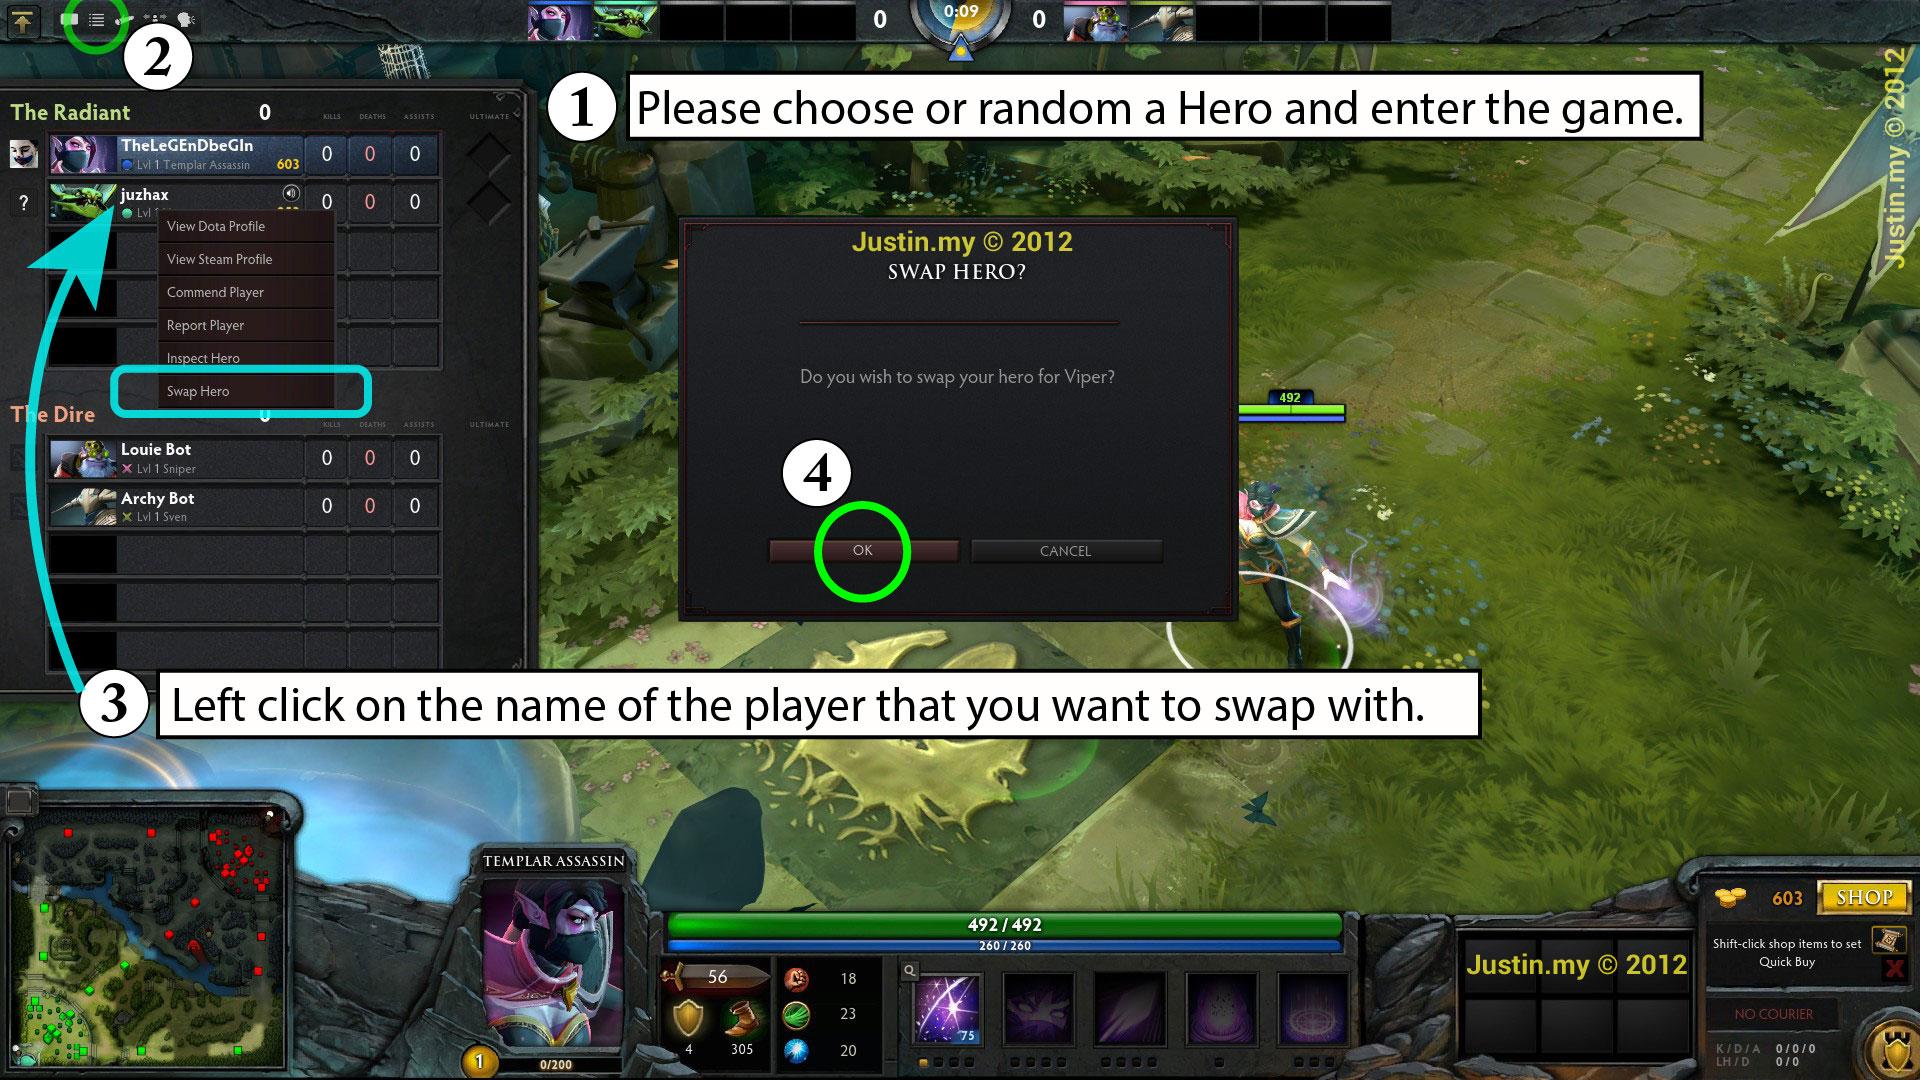 Como funciona o matchmaking Dota 2